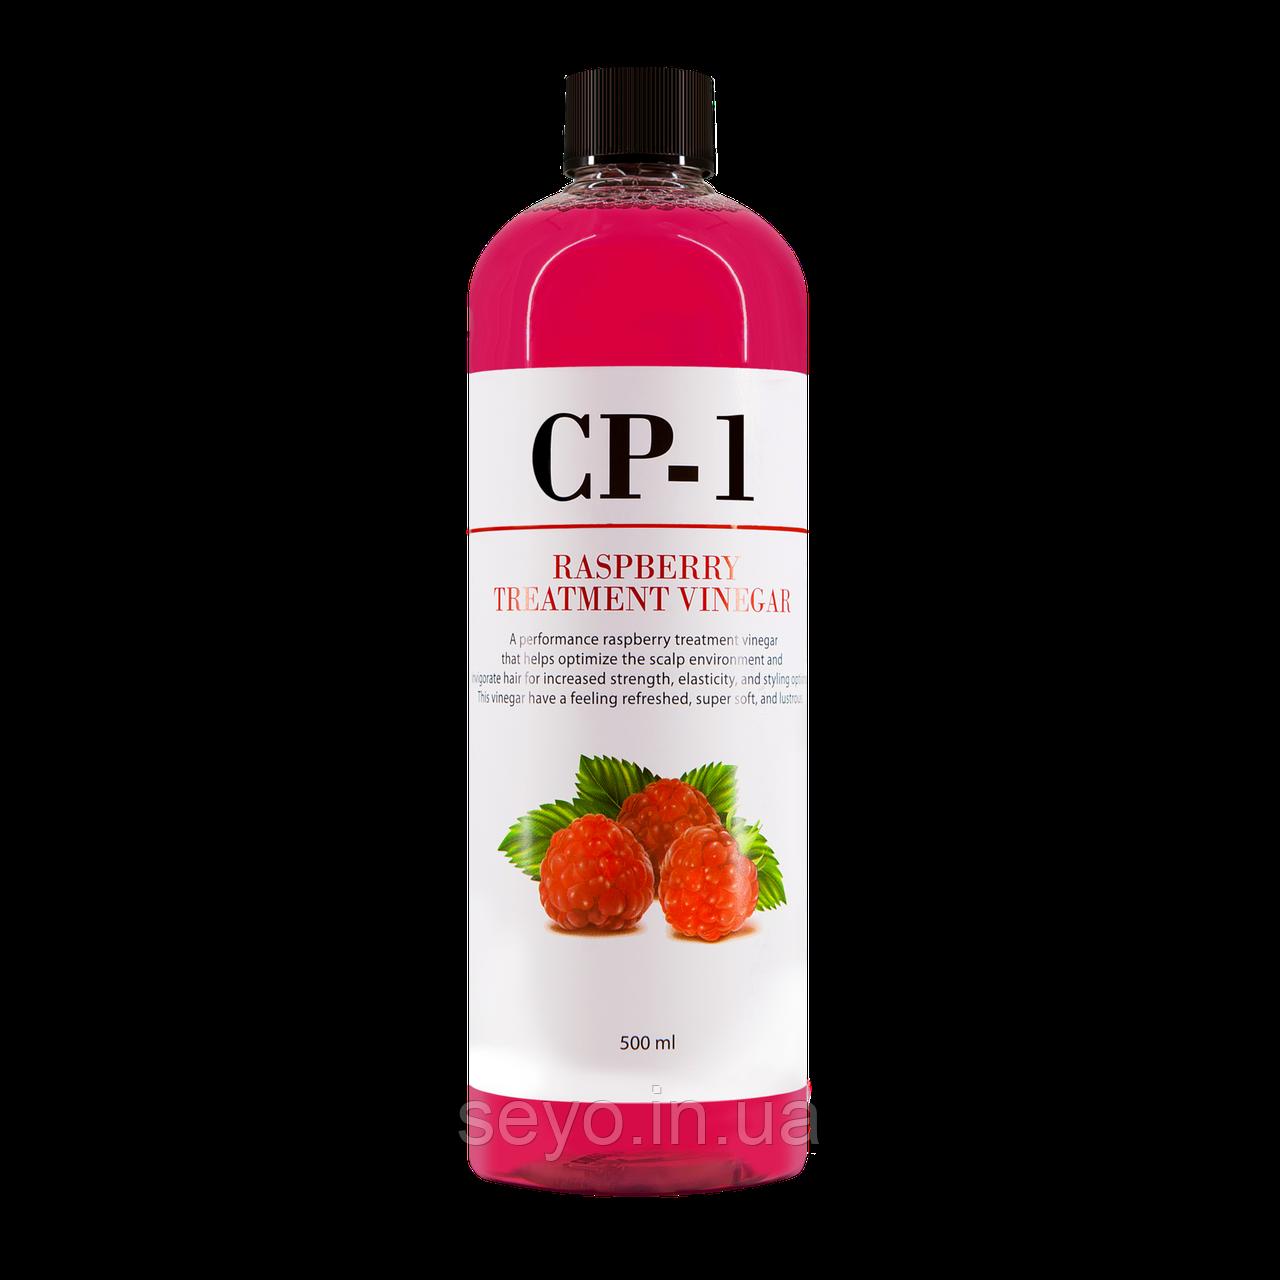 Кондиционер ополаскиватель на основе Малинового уксуса CP-1 Raspberry Treatment Vinegar, 500 мл